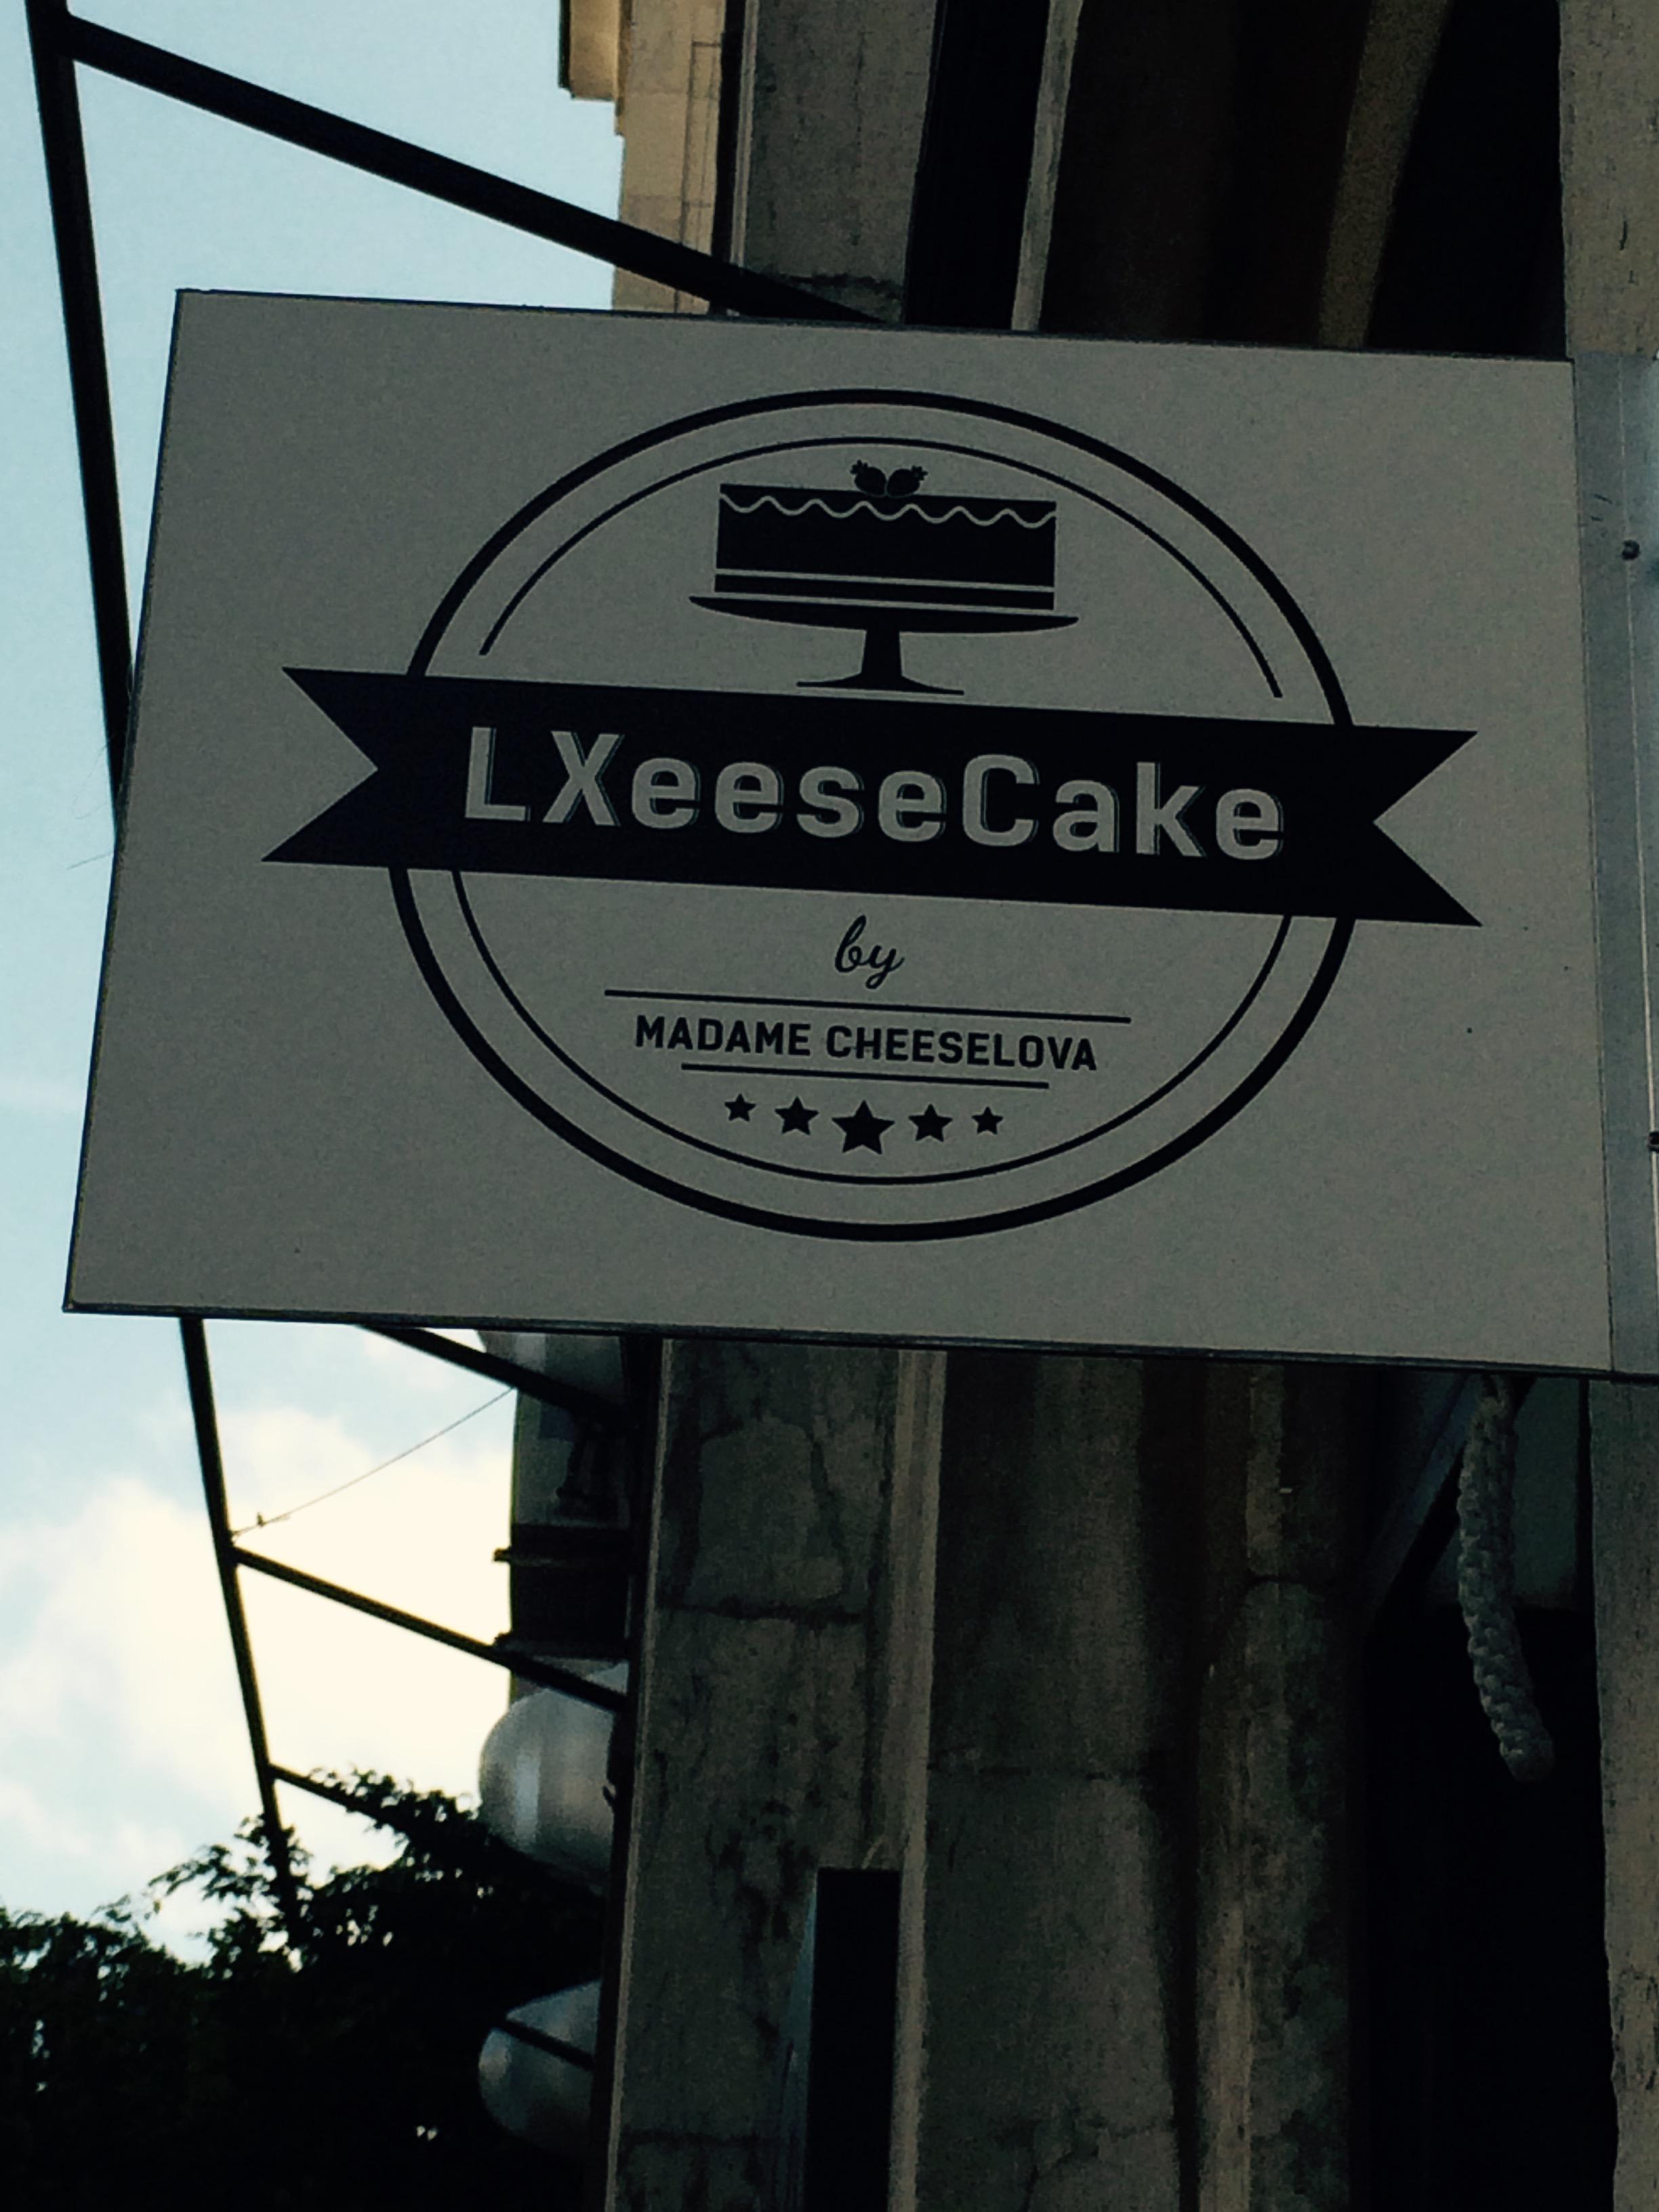 LXeeseCake sign © Nina Santos